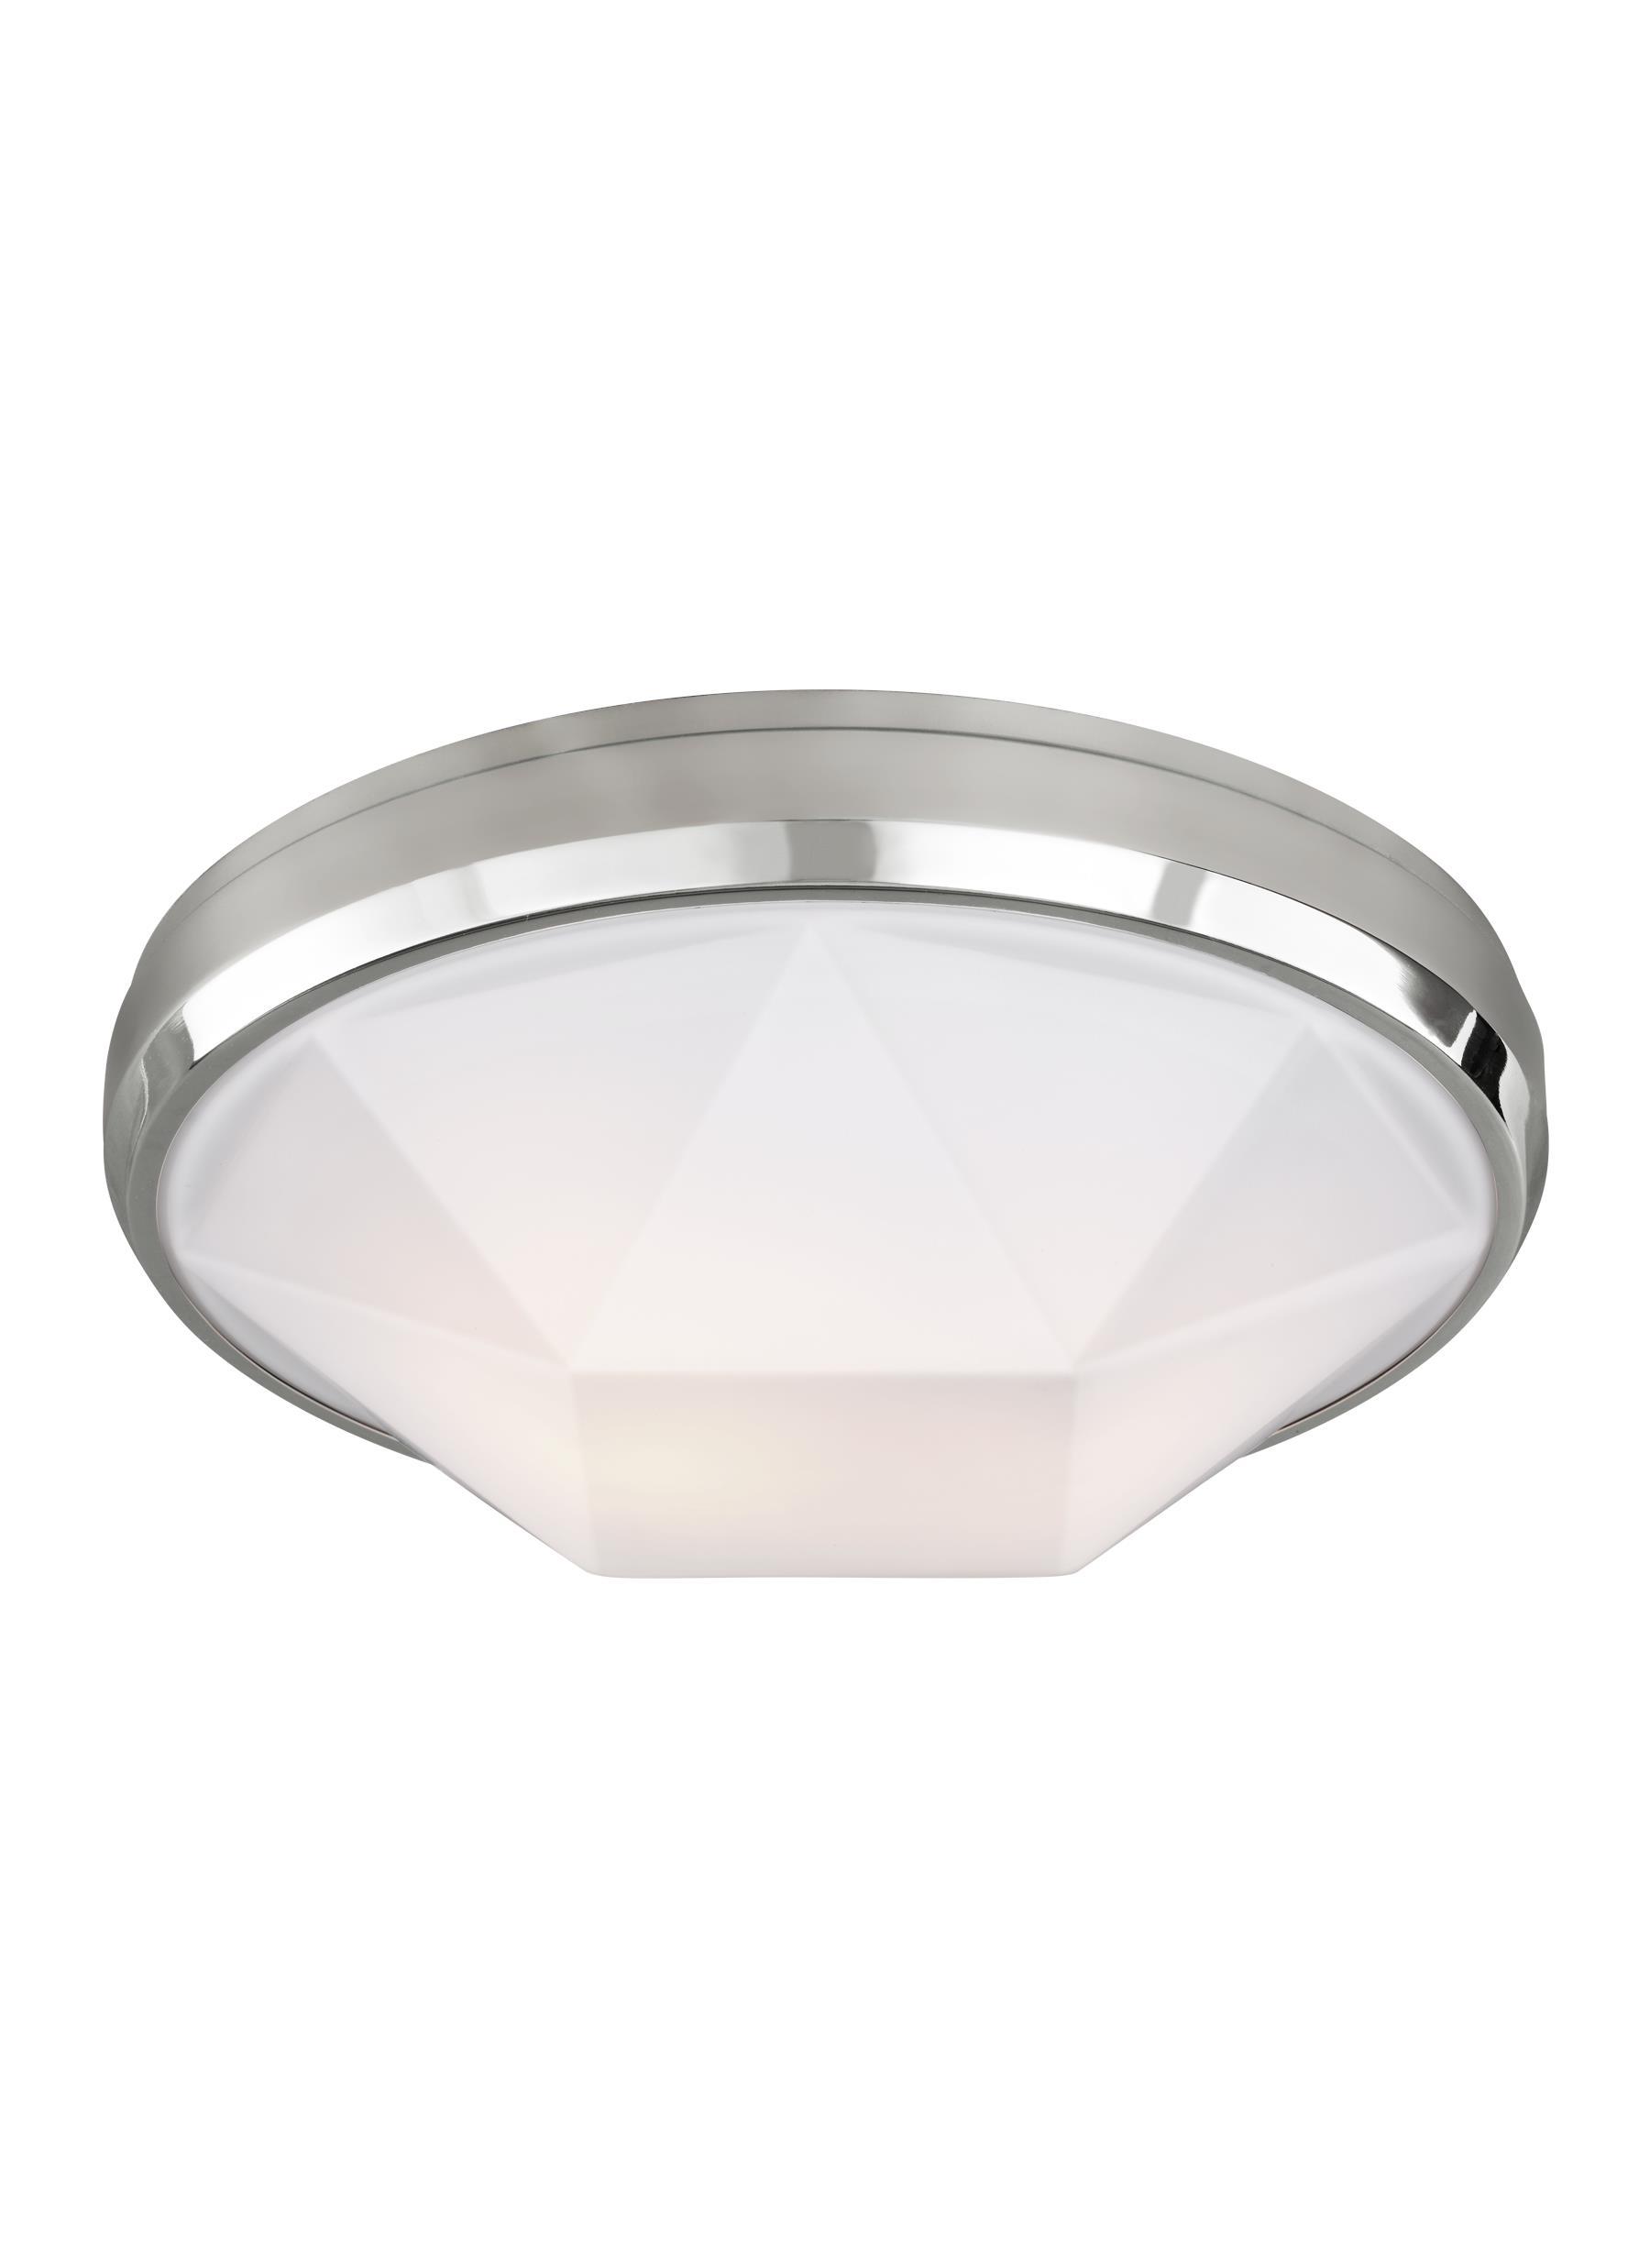 FM515CH 2 Light Flushmount Chrome